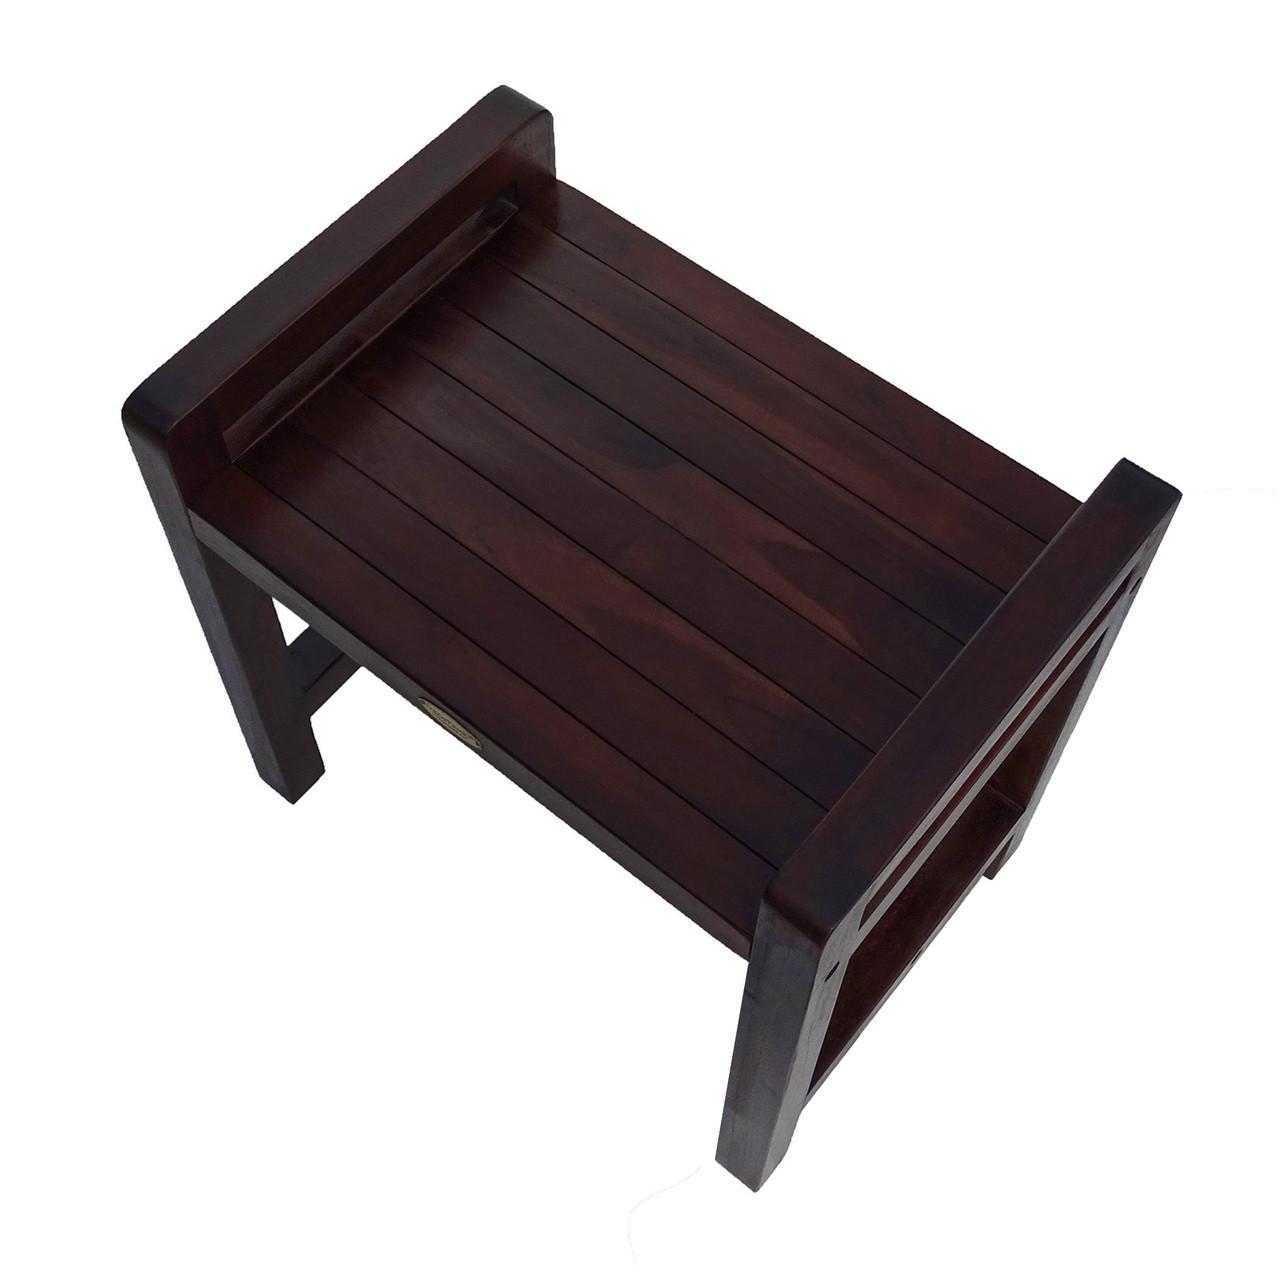 "DecoTeak Eleganto 20"" Teak Wood Shower Bench with LiftAide Arms in Woodland Brown Finish"